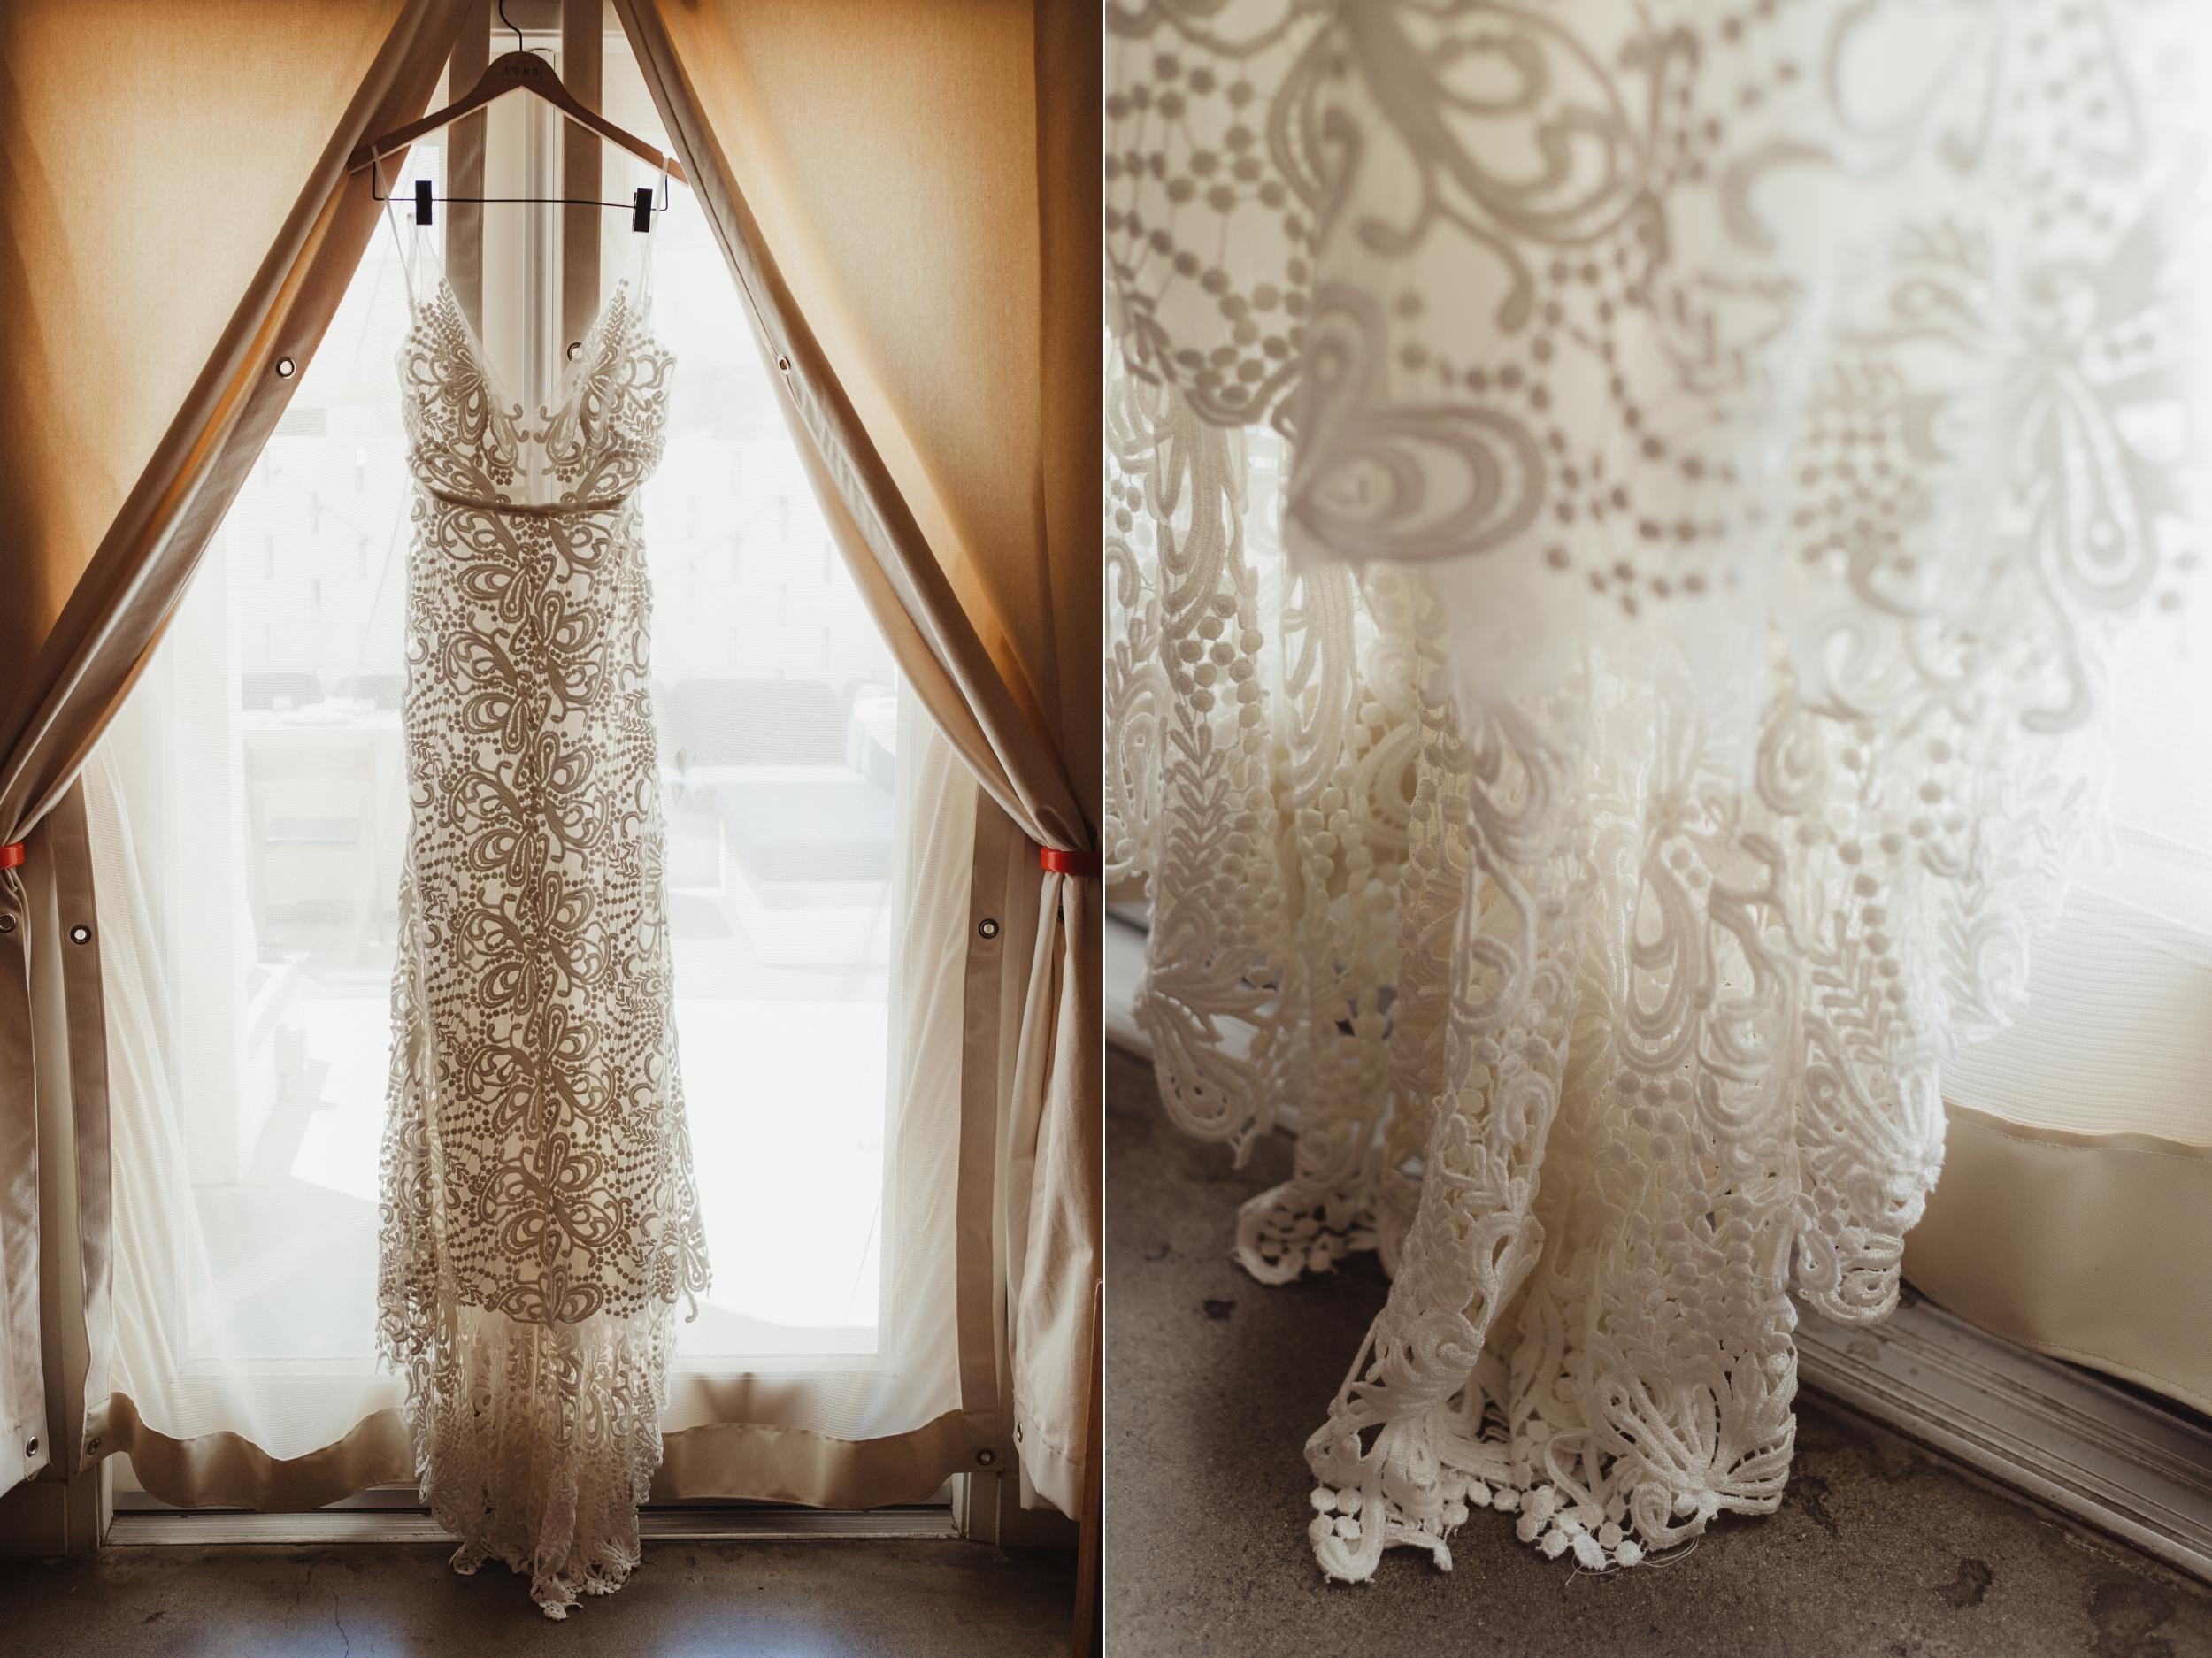 10-13-joshua-tree-ace-hotel-wedding-vivianchen-014_WEB.jpg